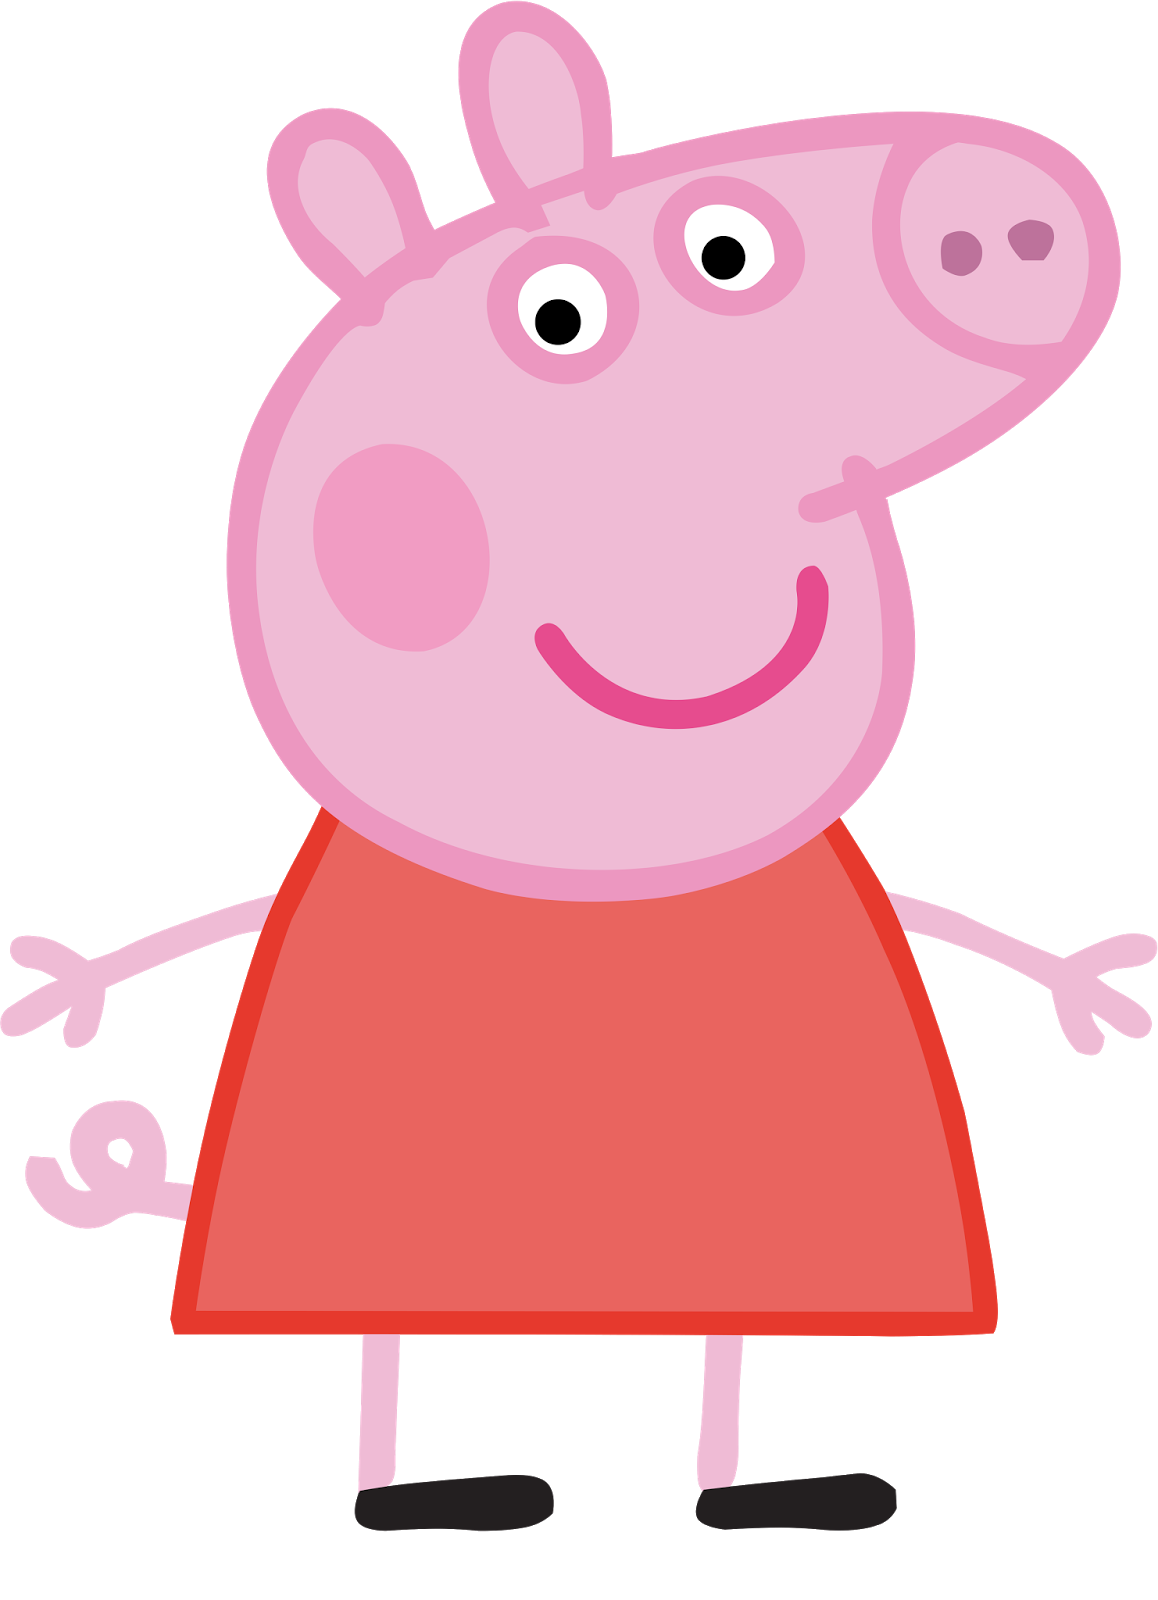 Peppa pig house clipart clip art transparent Cartoon Characters: Peppa Pig PNG (HQ) | peppa pig birthday ... clip art transparent